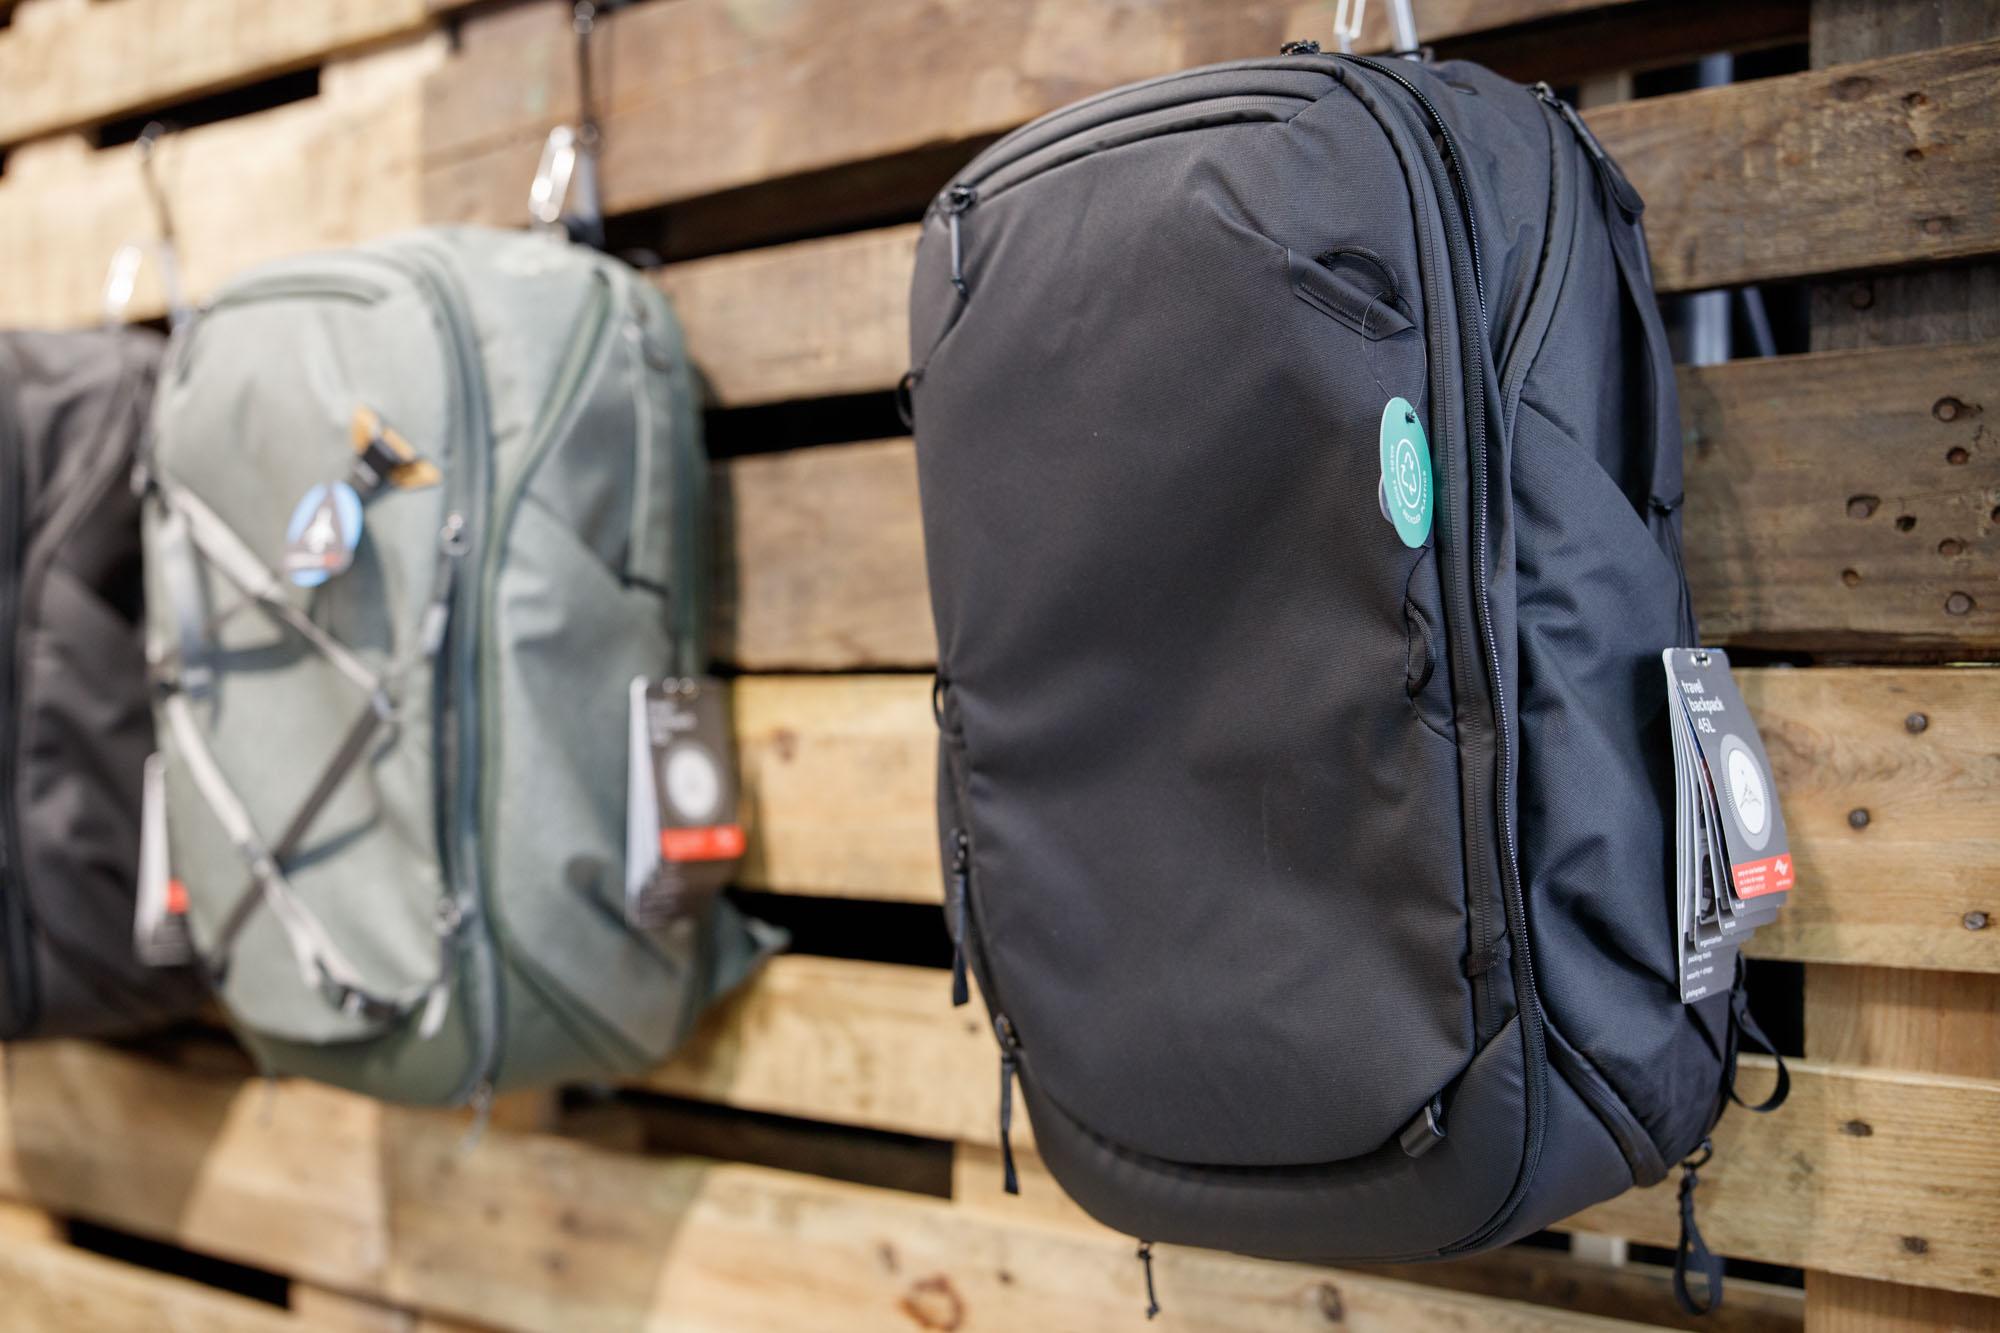 201f908097f13c Photokina 2018  hands-on with eight stylish new bags – My Digital ...